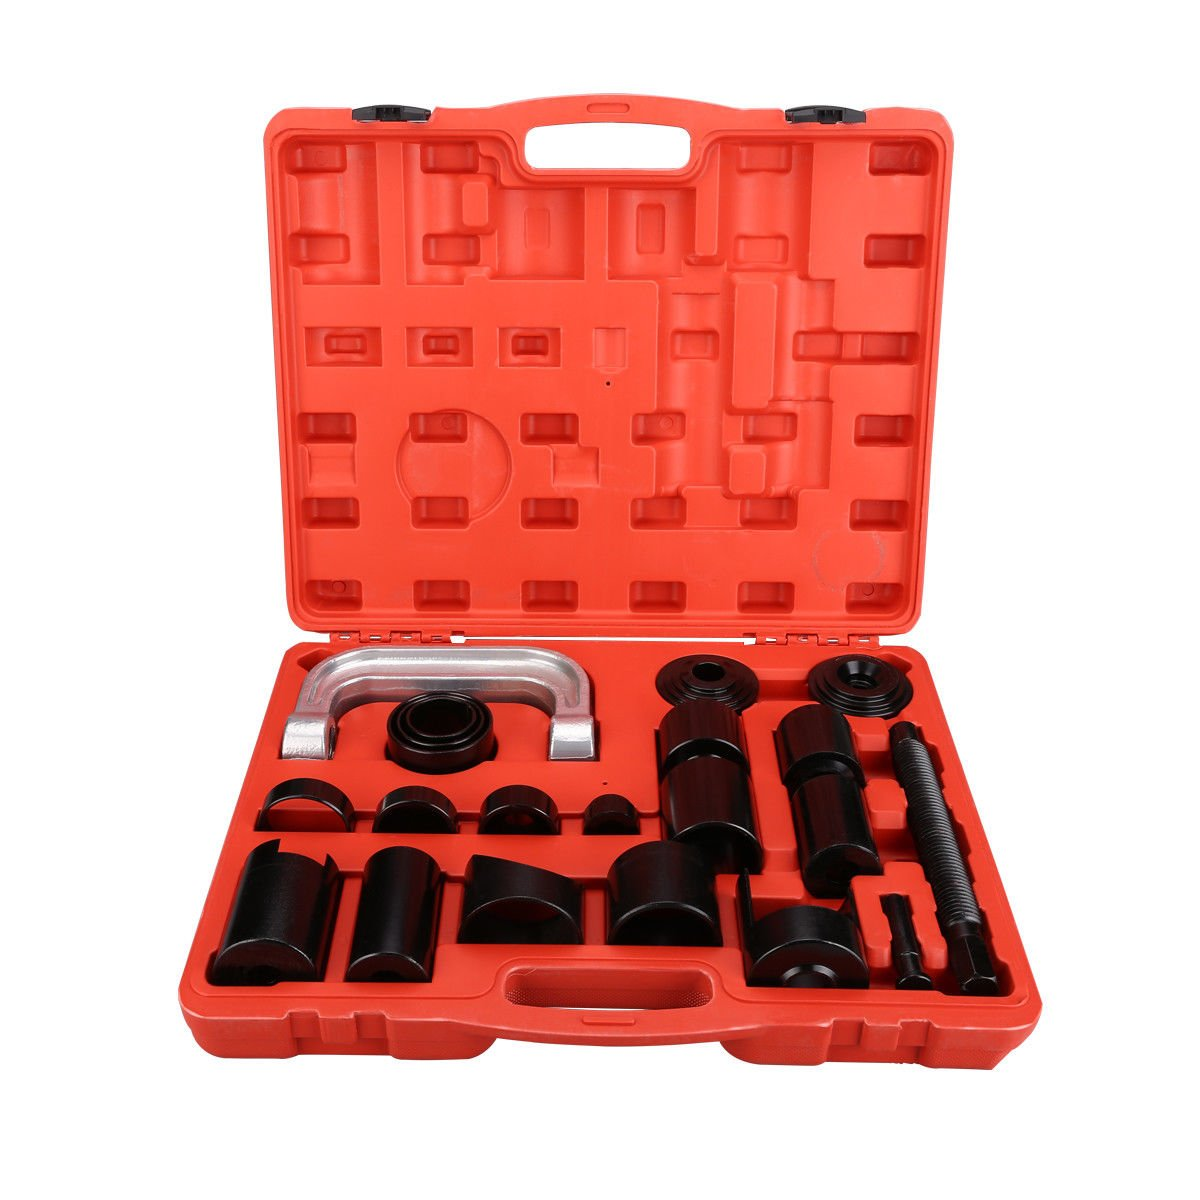 mewinshop 21 Pcs Press Truck Car Ball Joint Nice Deluxe Set Service Kit Remover Installer